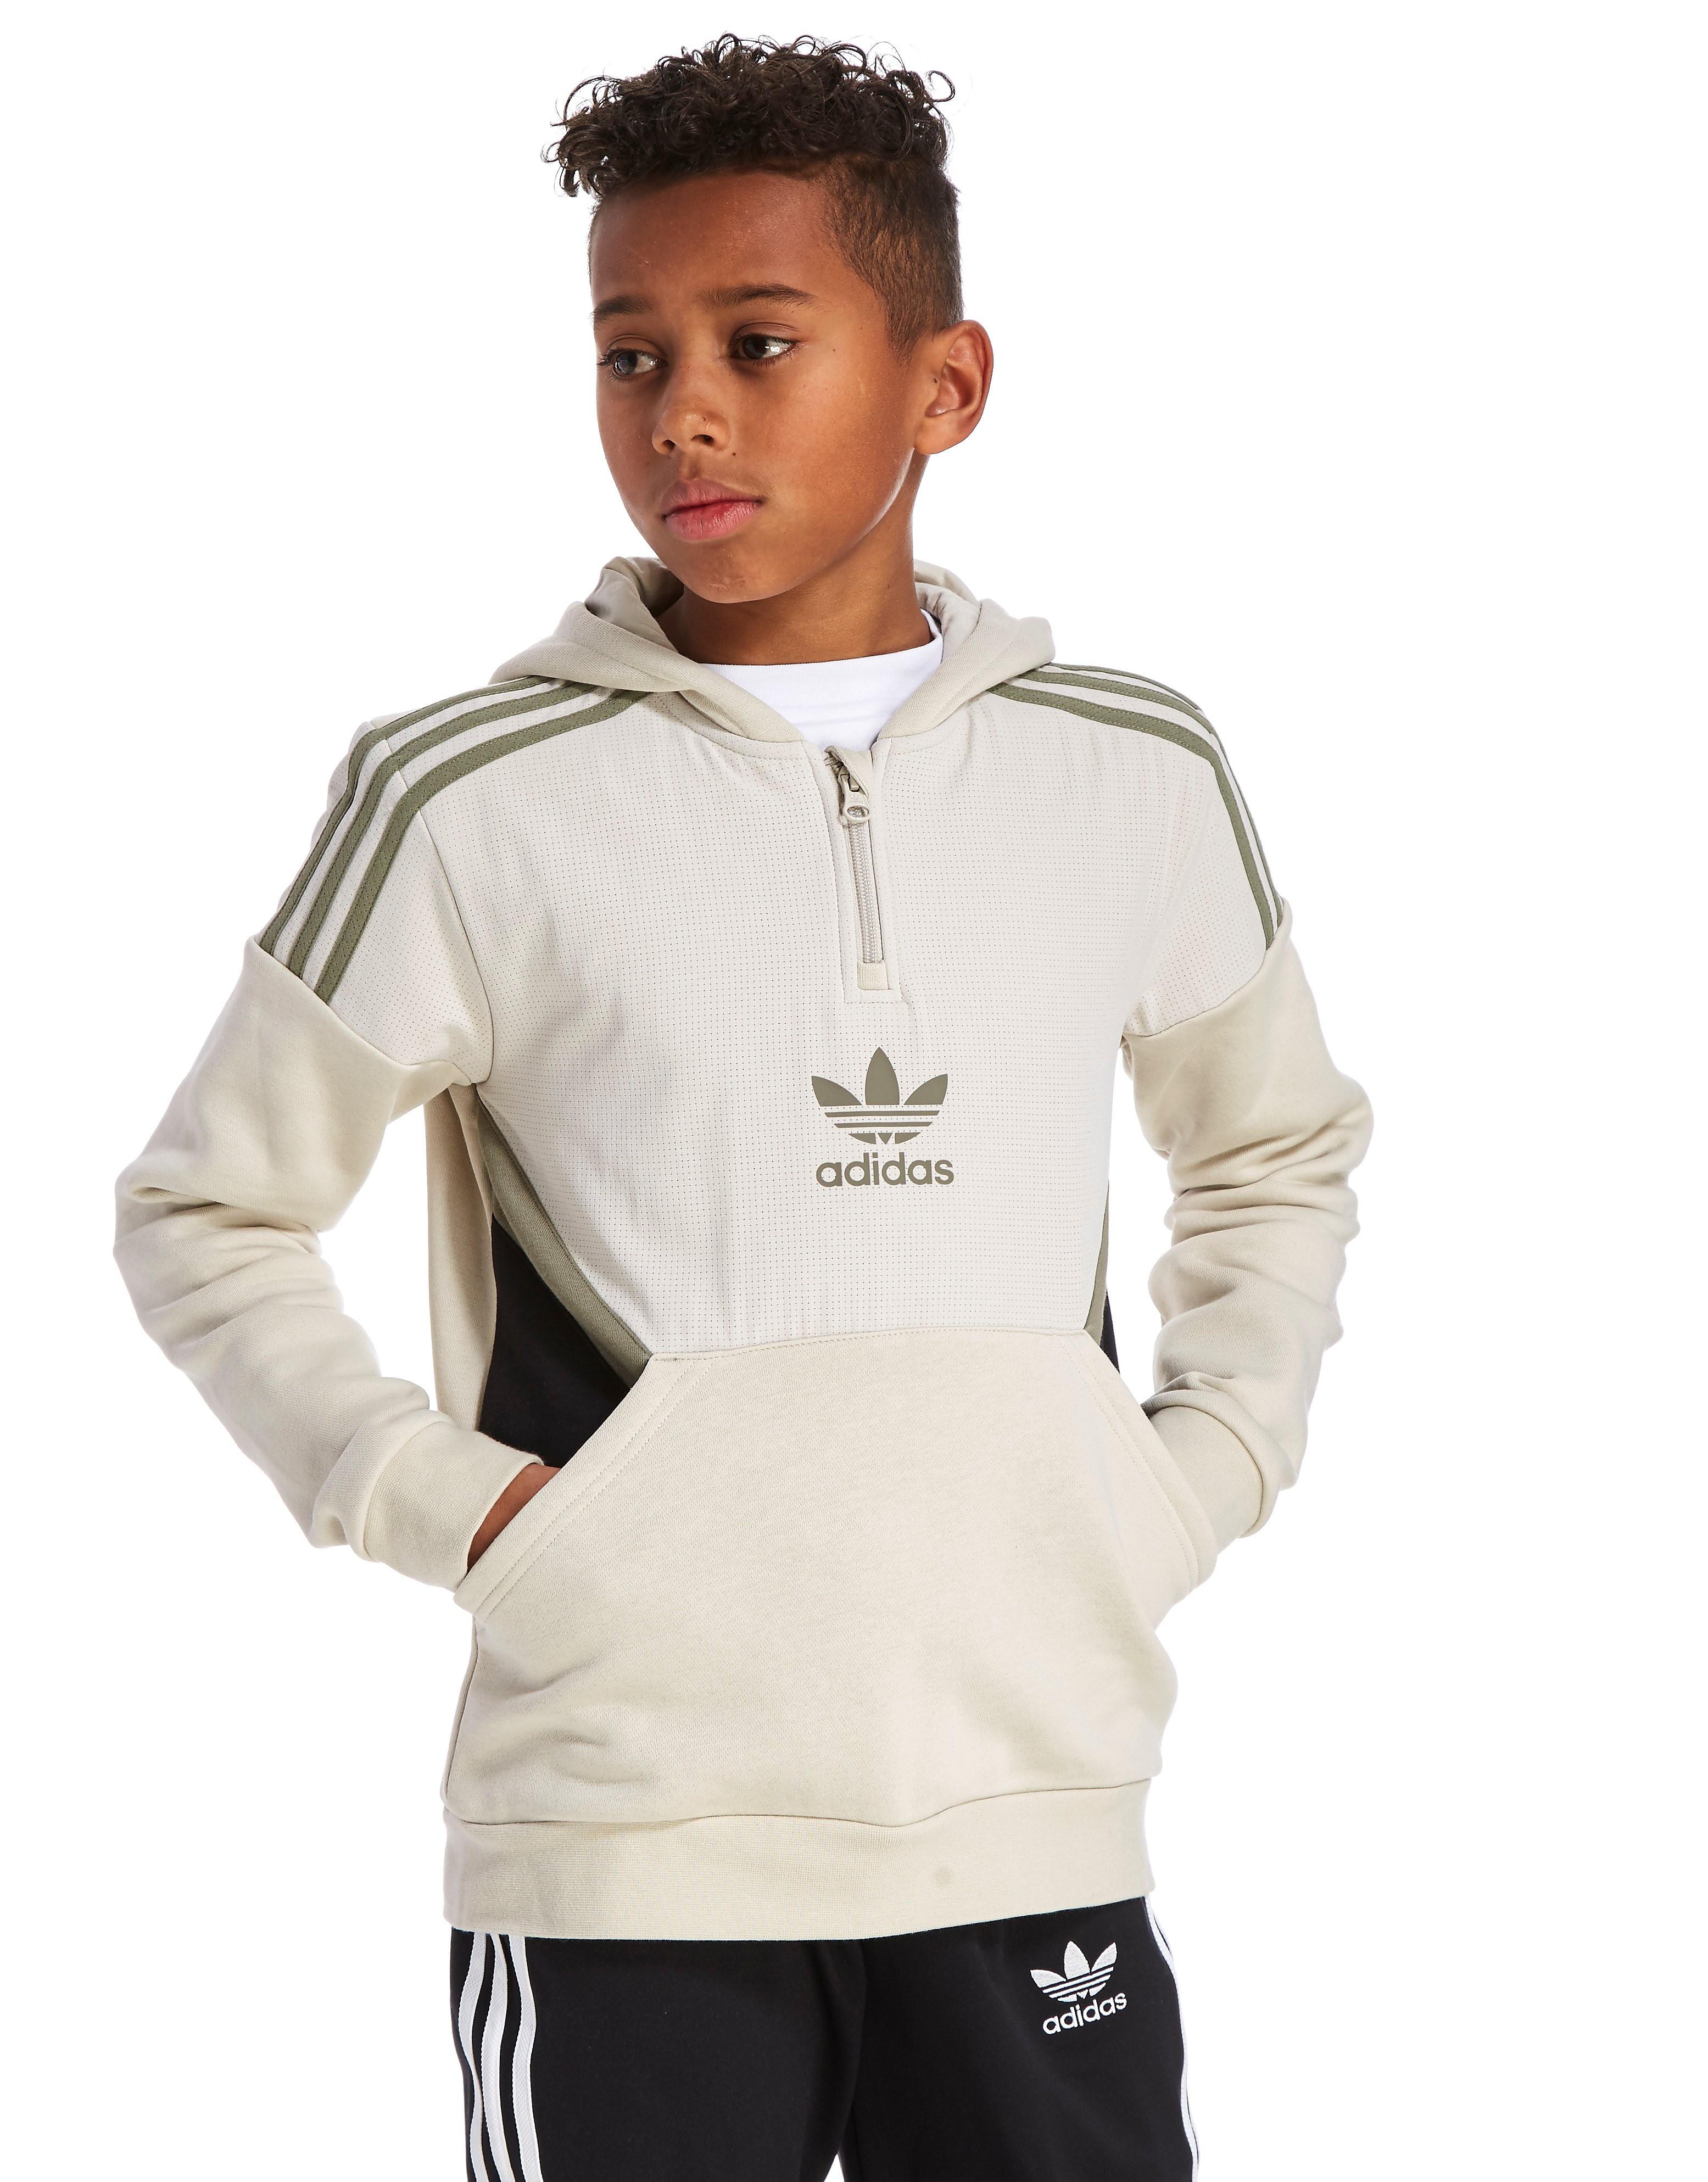 adidas Originals Europe 1/4 Zip Hoodie Junior - Only at JD - blanc, blanc